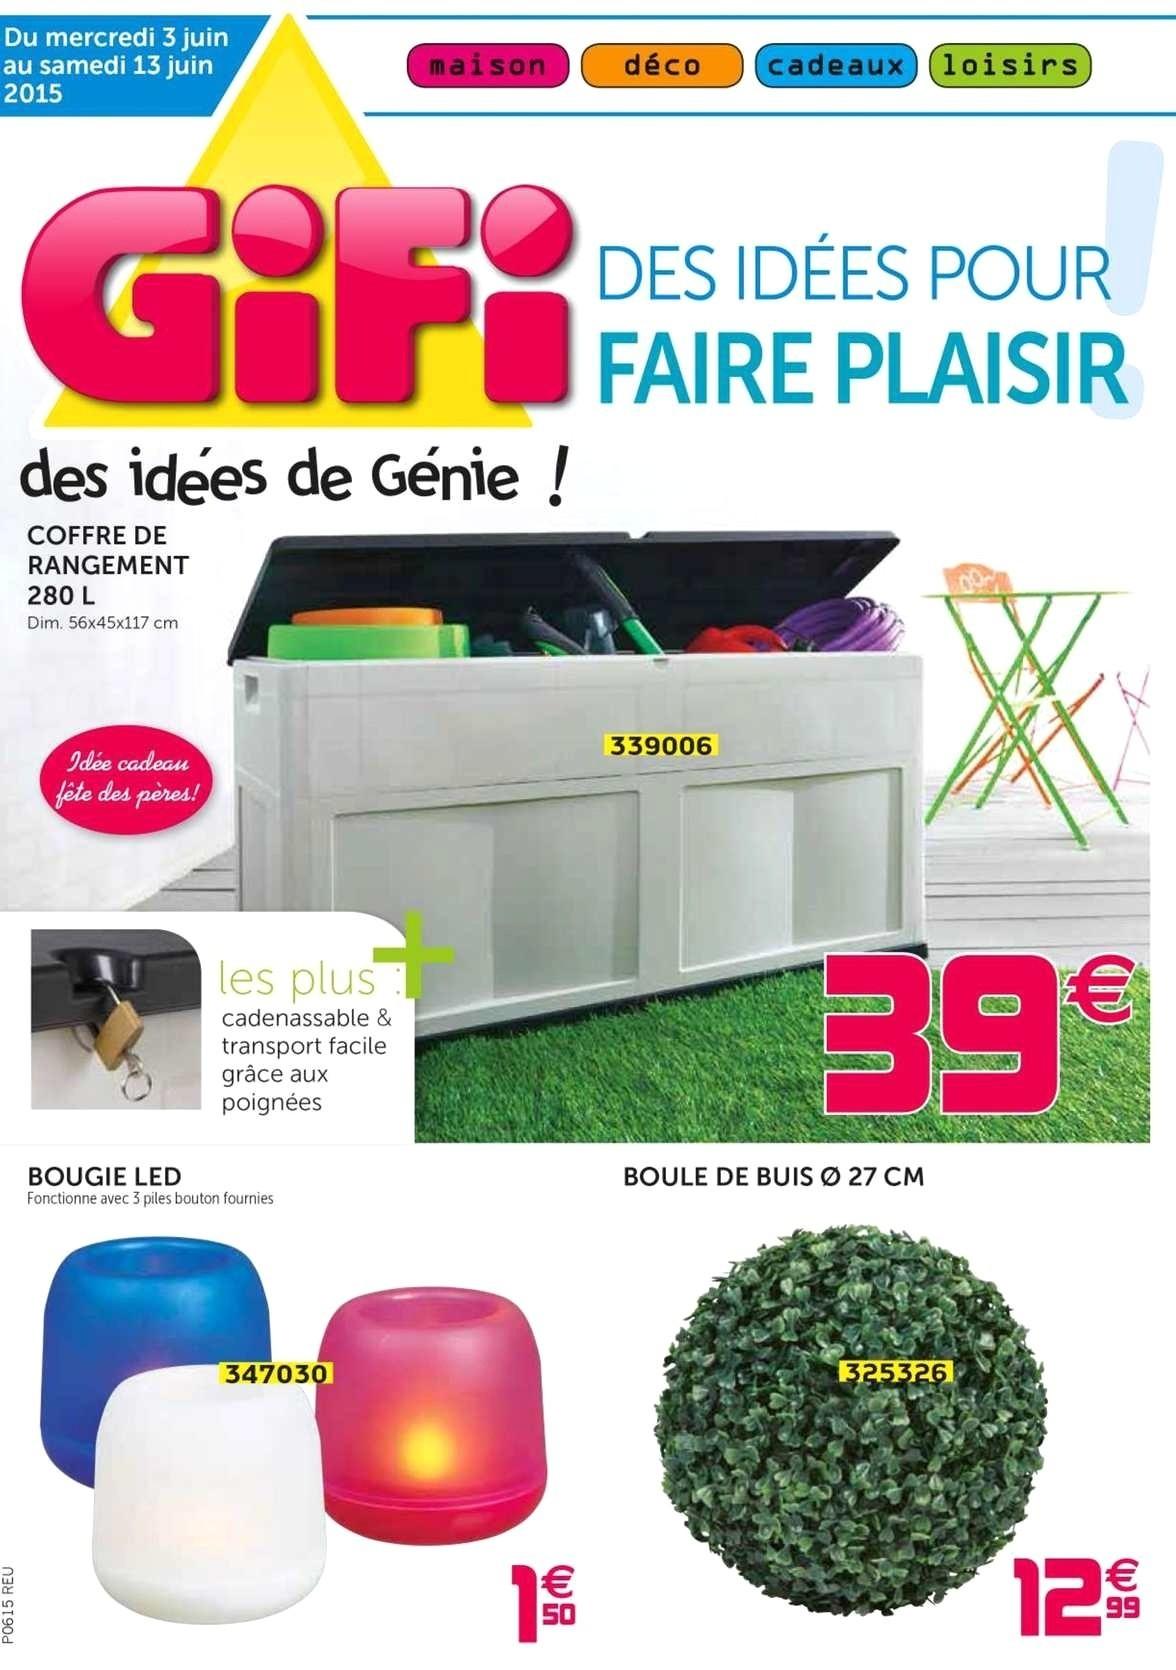 Gifi Housse Clic Clac Inspirant Images Matelas Design Merveilleux Matelas Intex Gifi Impressionnant Les